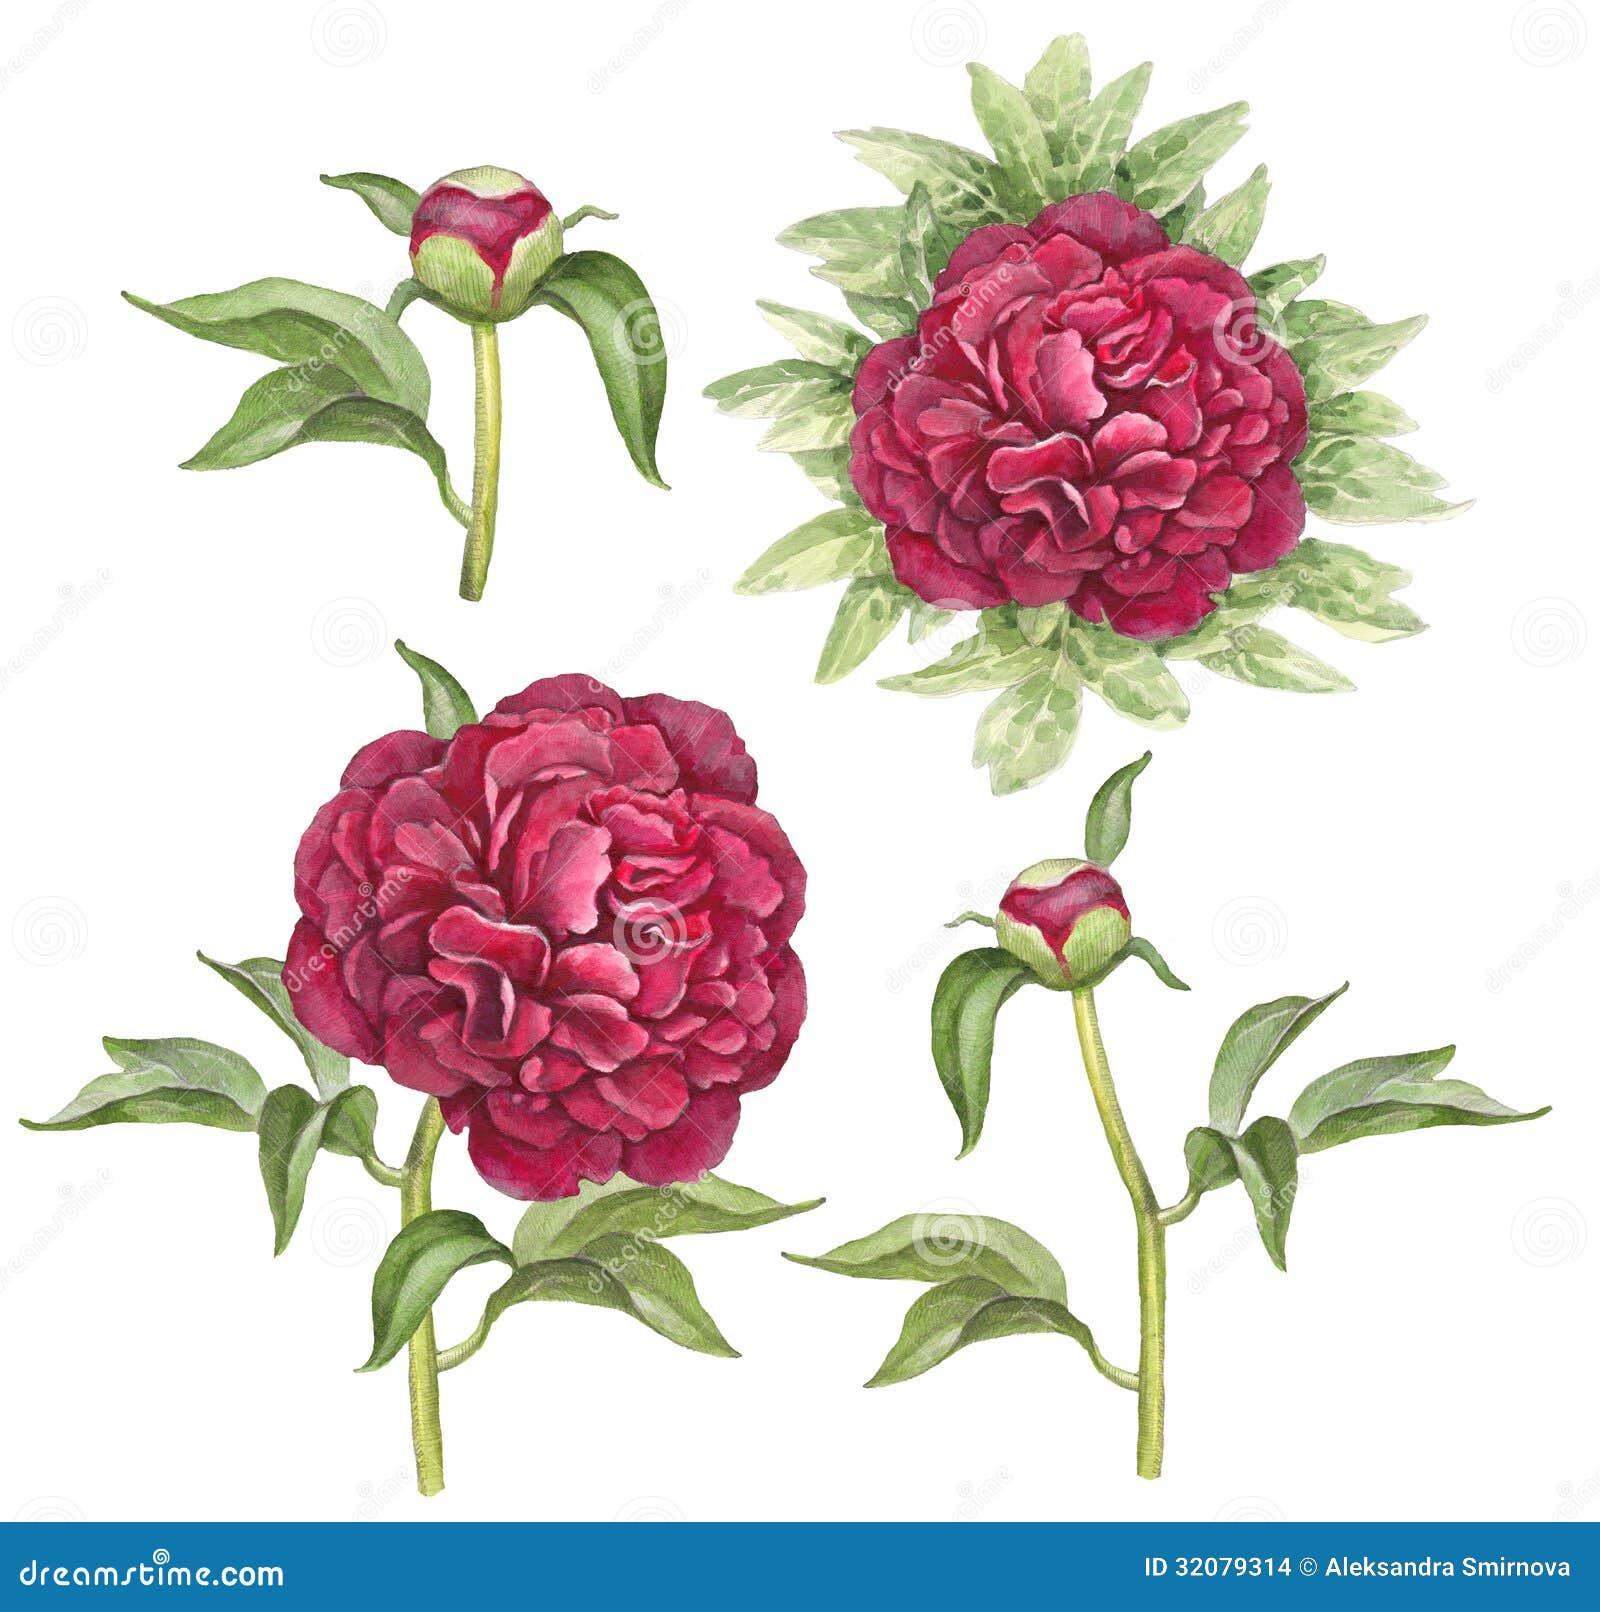 Illustration Of Peony Flowers Stock Images - Image: 32079314